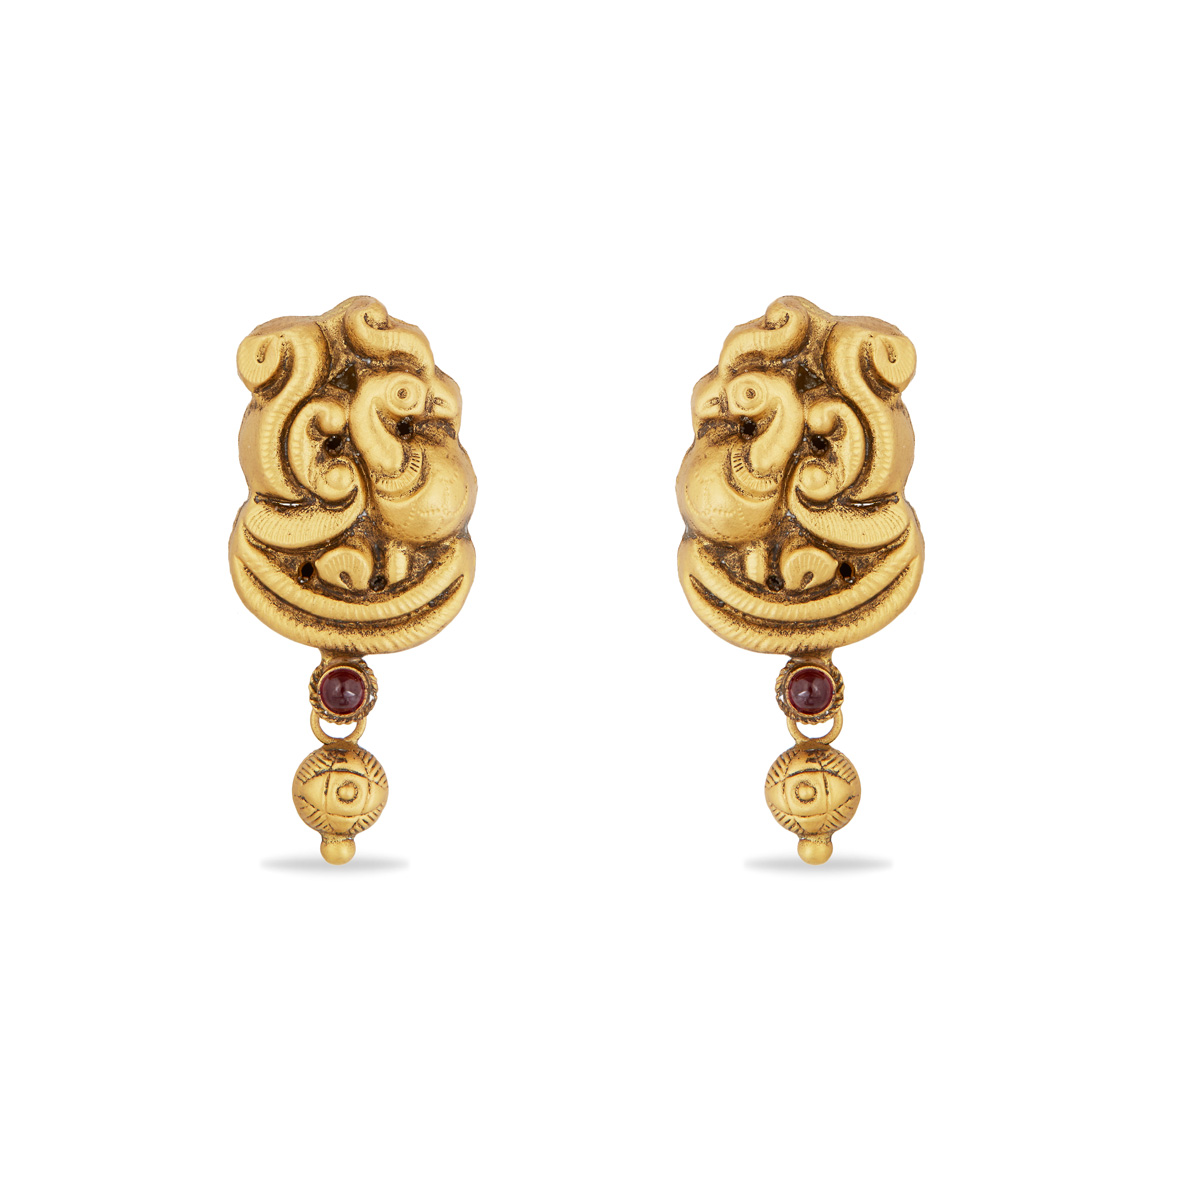 Lulita Povas Earrings